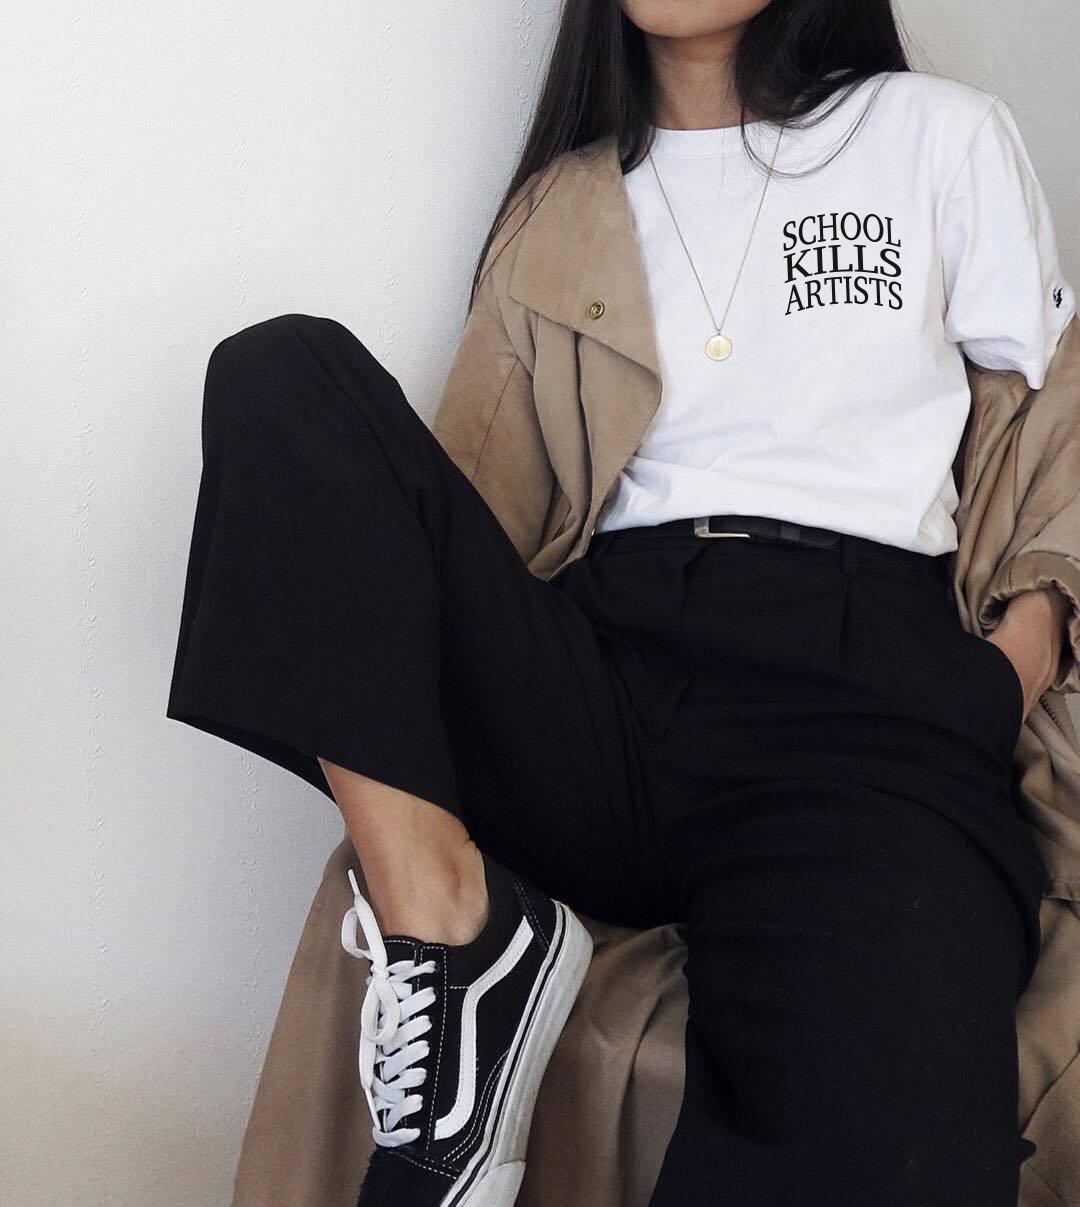 School Kills Artists T-Shirt grunge moda grunge outfit grunge outif grunge wallpapes aesthetic